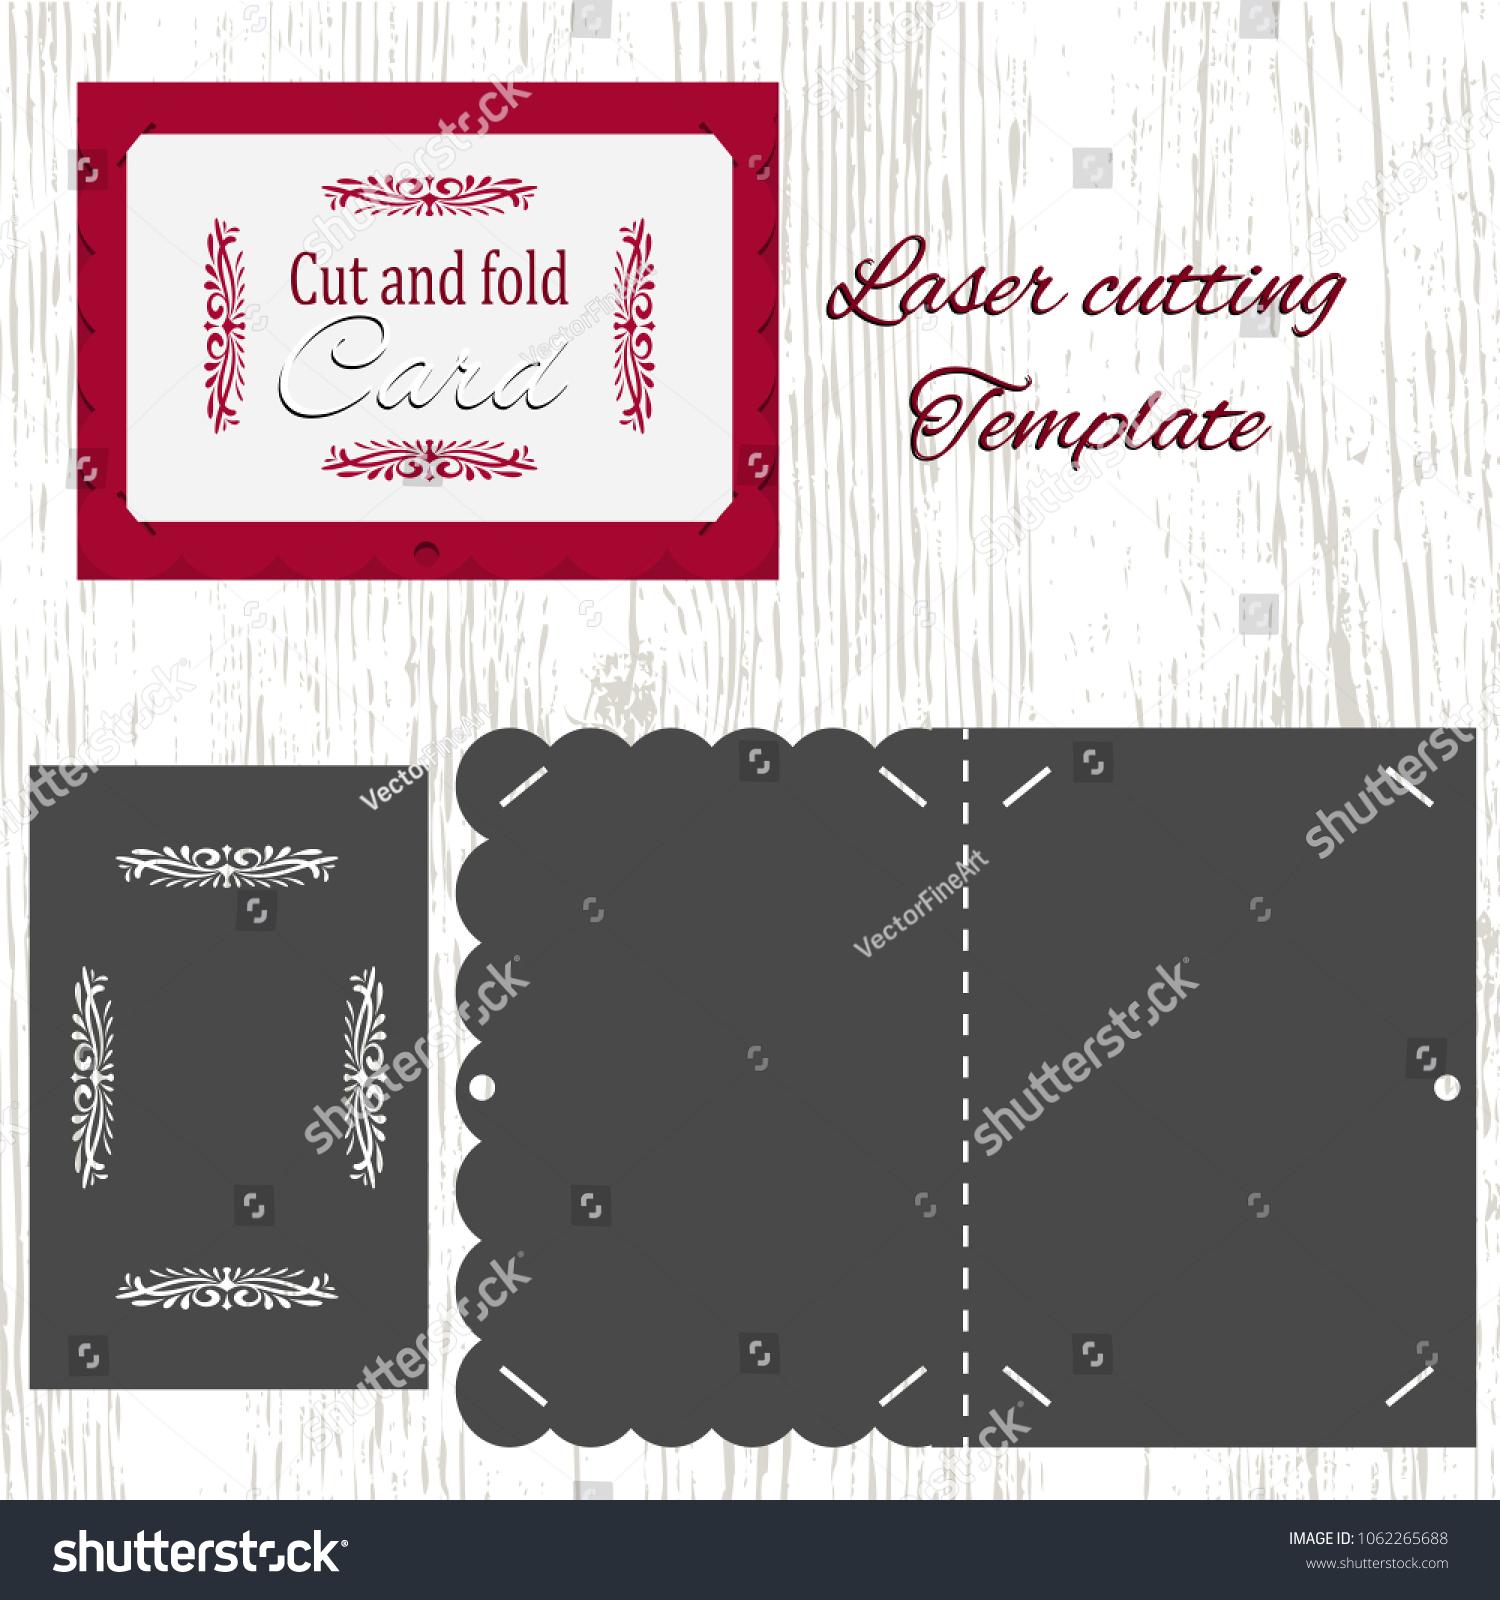 Cut Fold Vector Card Template Suitable Stock Vector 1062265688 ...